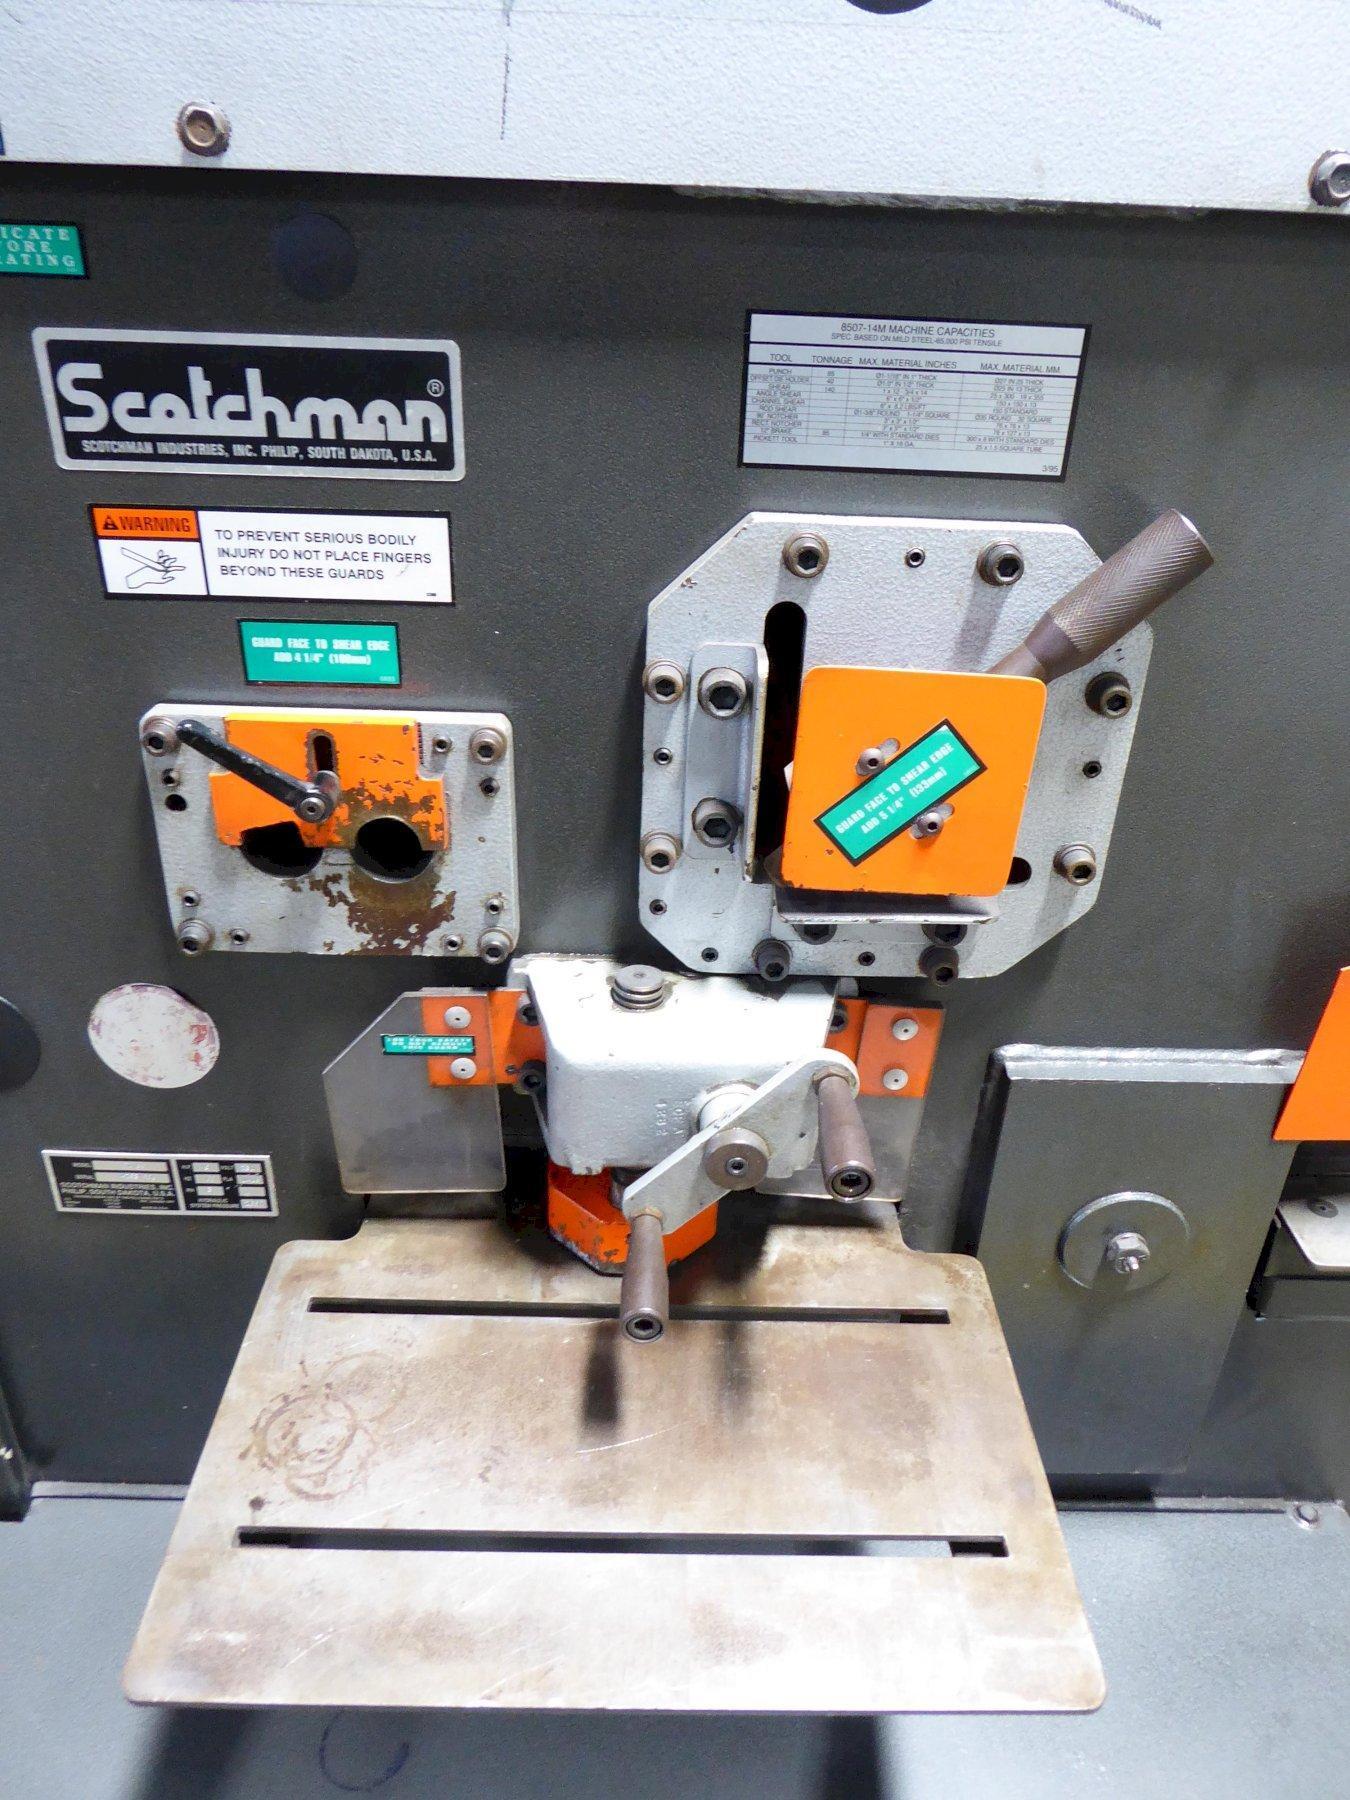 85 Ton SCOTCHMAN Hydraulic Ironworker, FI-8507, Five Station, Nice